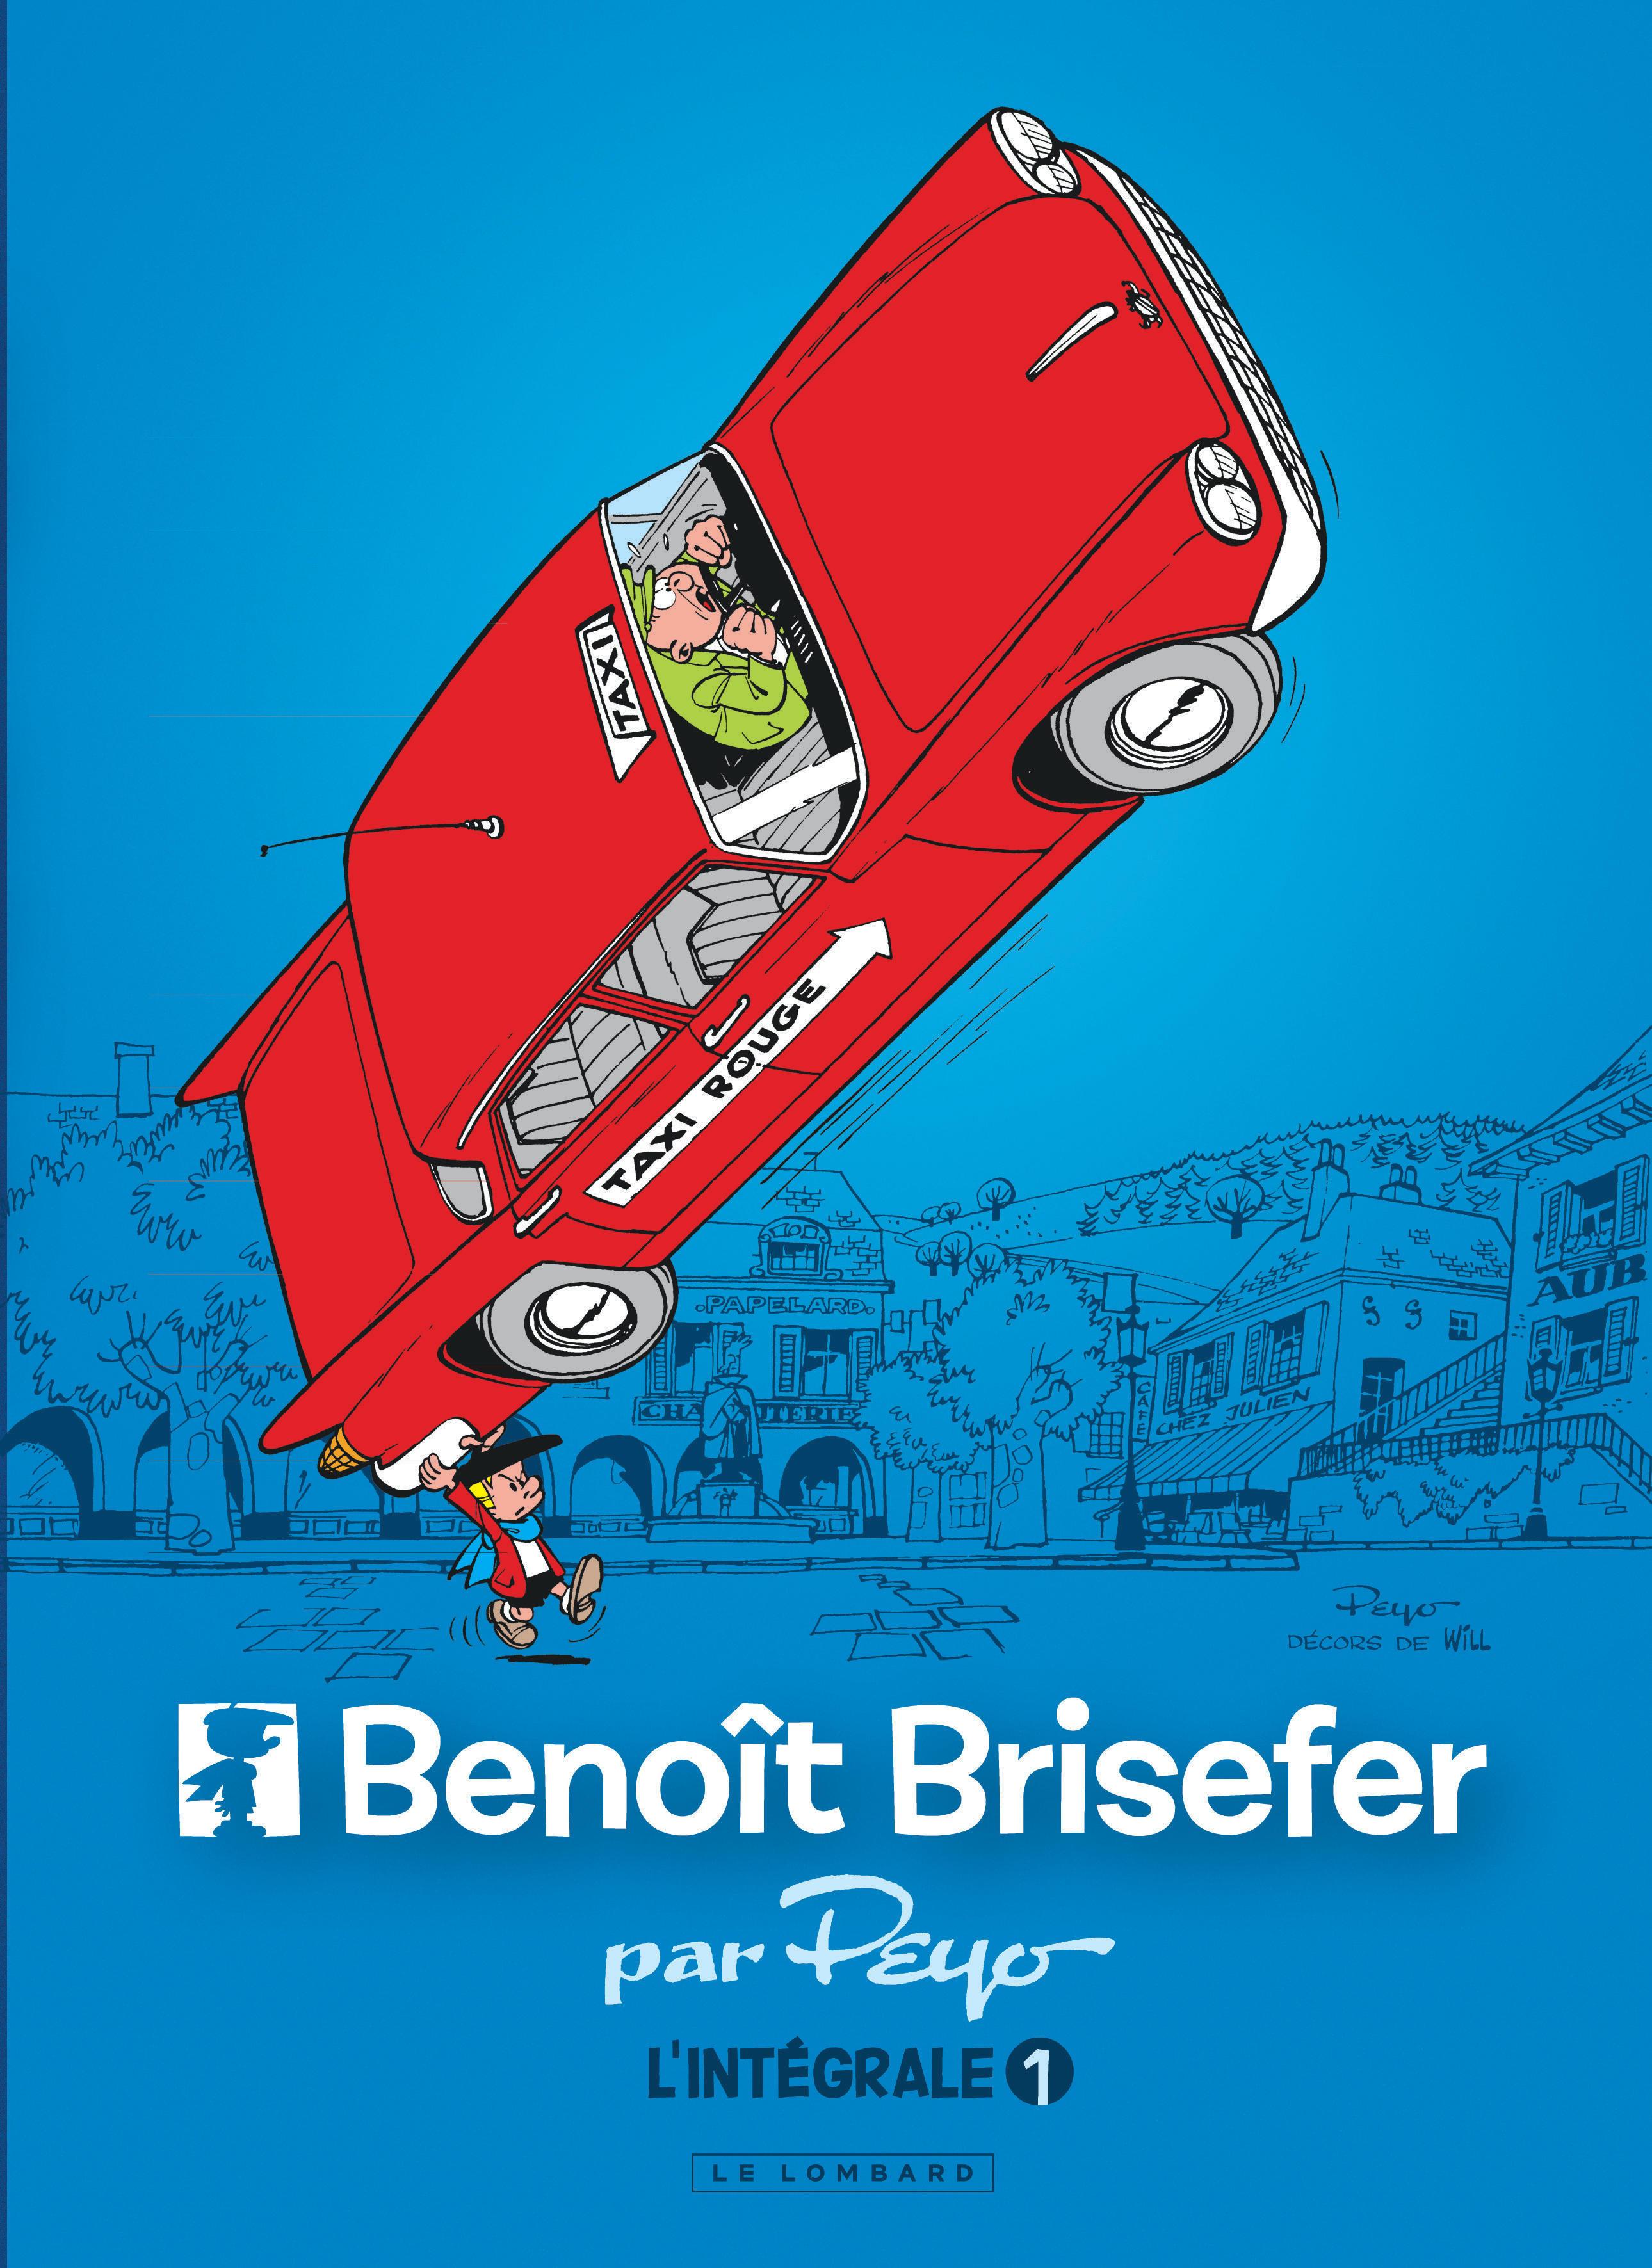 BENOIT BRISEFER T1 INTEGRALE BENOIT BRISEFER 1